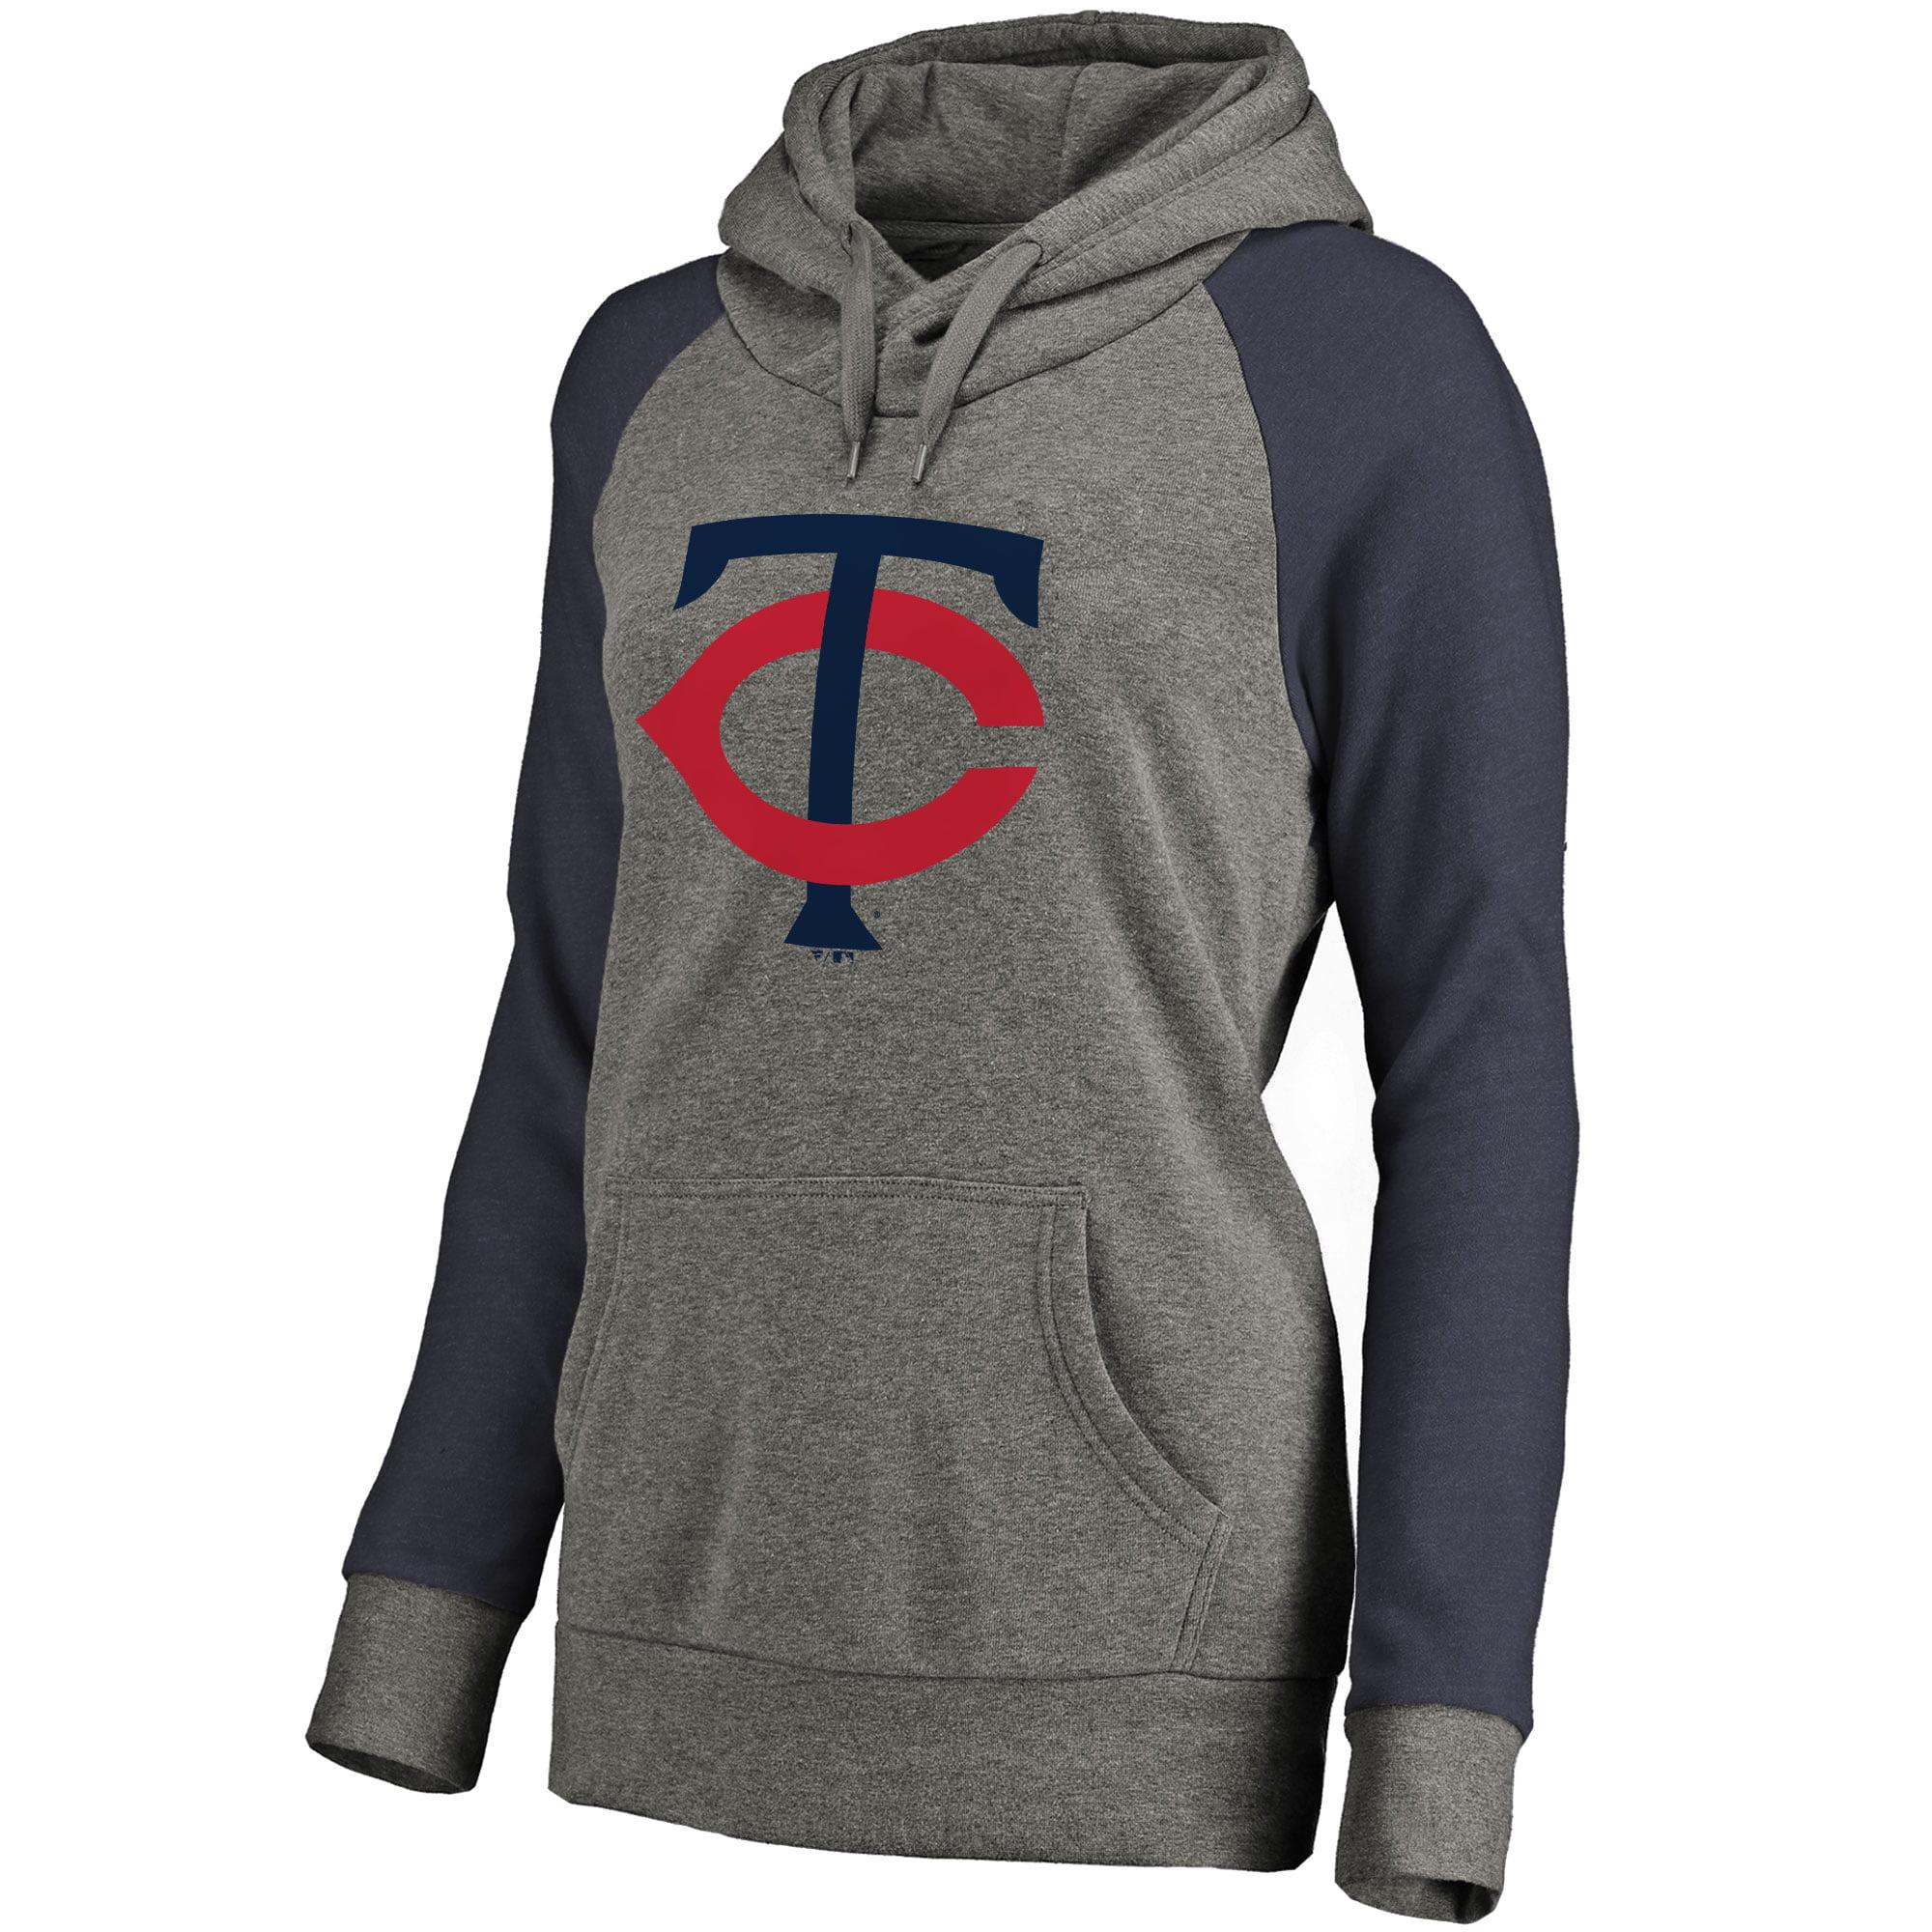 Minnesota Twins Women's Primary Logo Raglan Sleeve Tri-Blend Pullover Hoodie - Ash